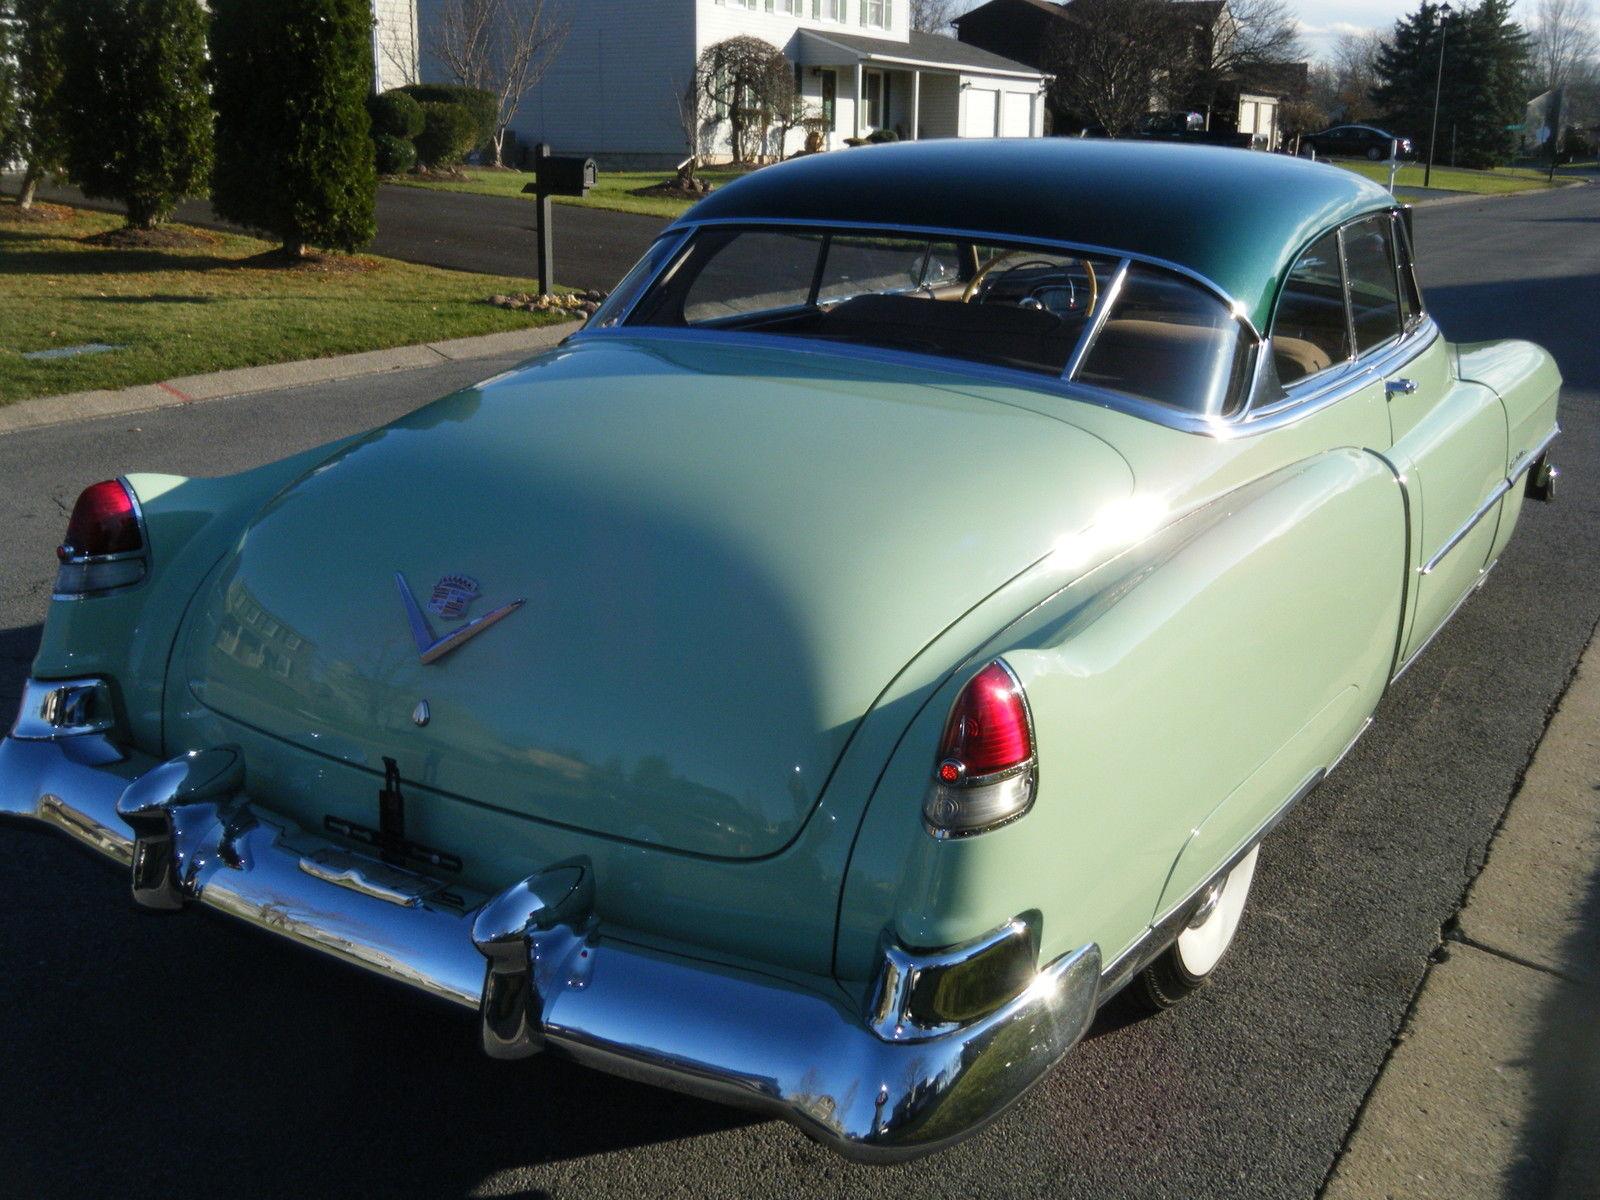 1951 Cadillac Coupe Rare Original Time Capsule 1950 1952 1953 Sedan Deville 1959 1960